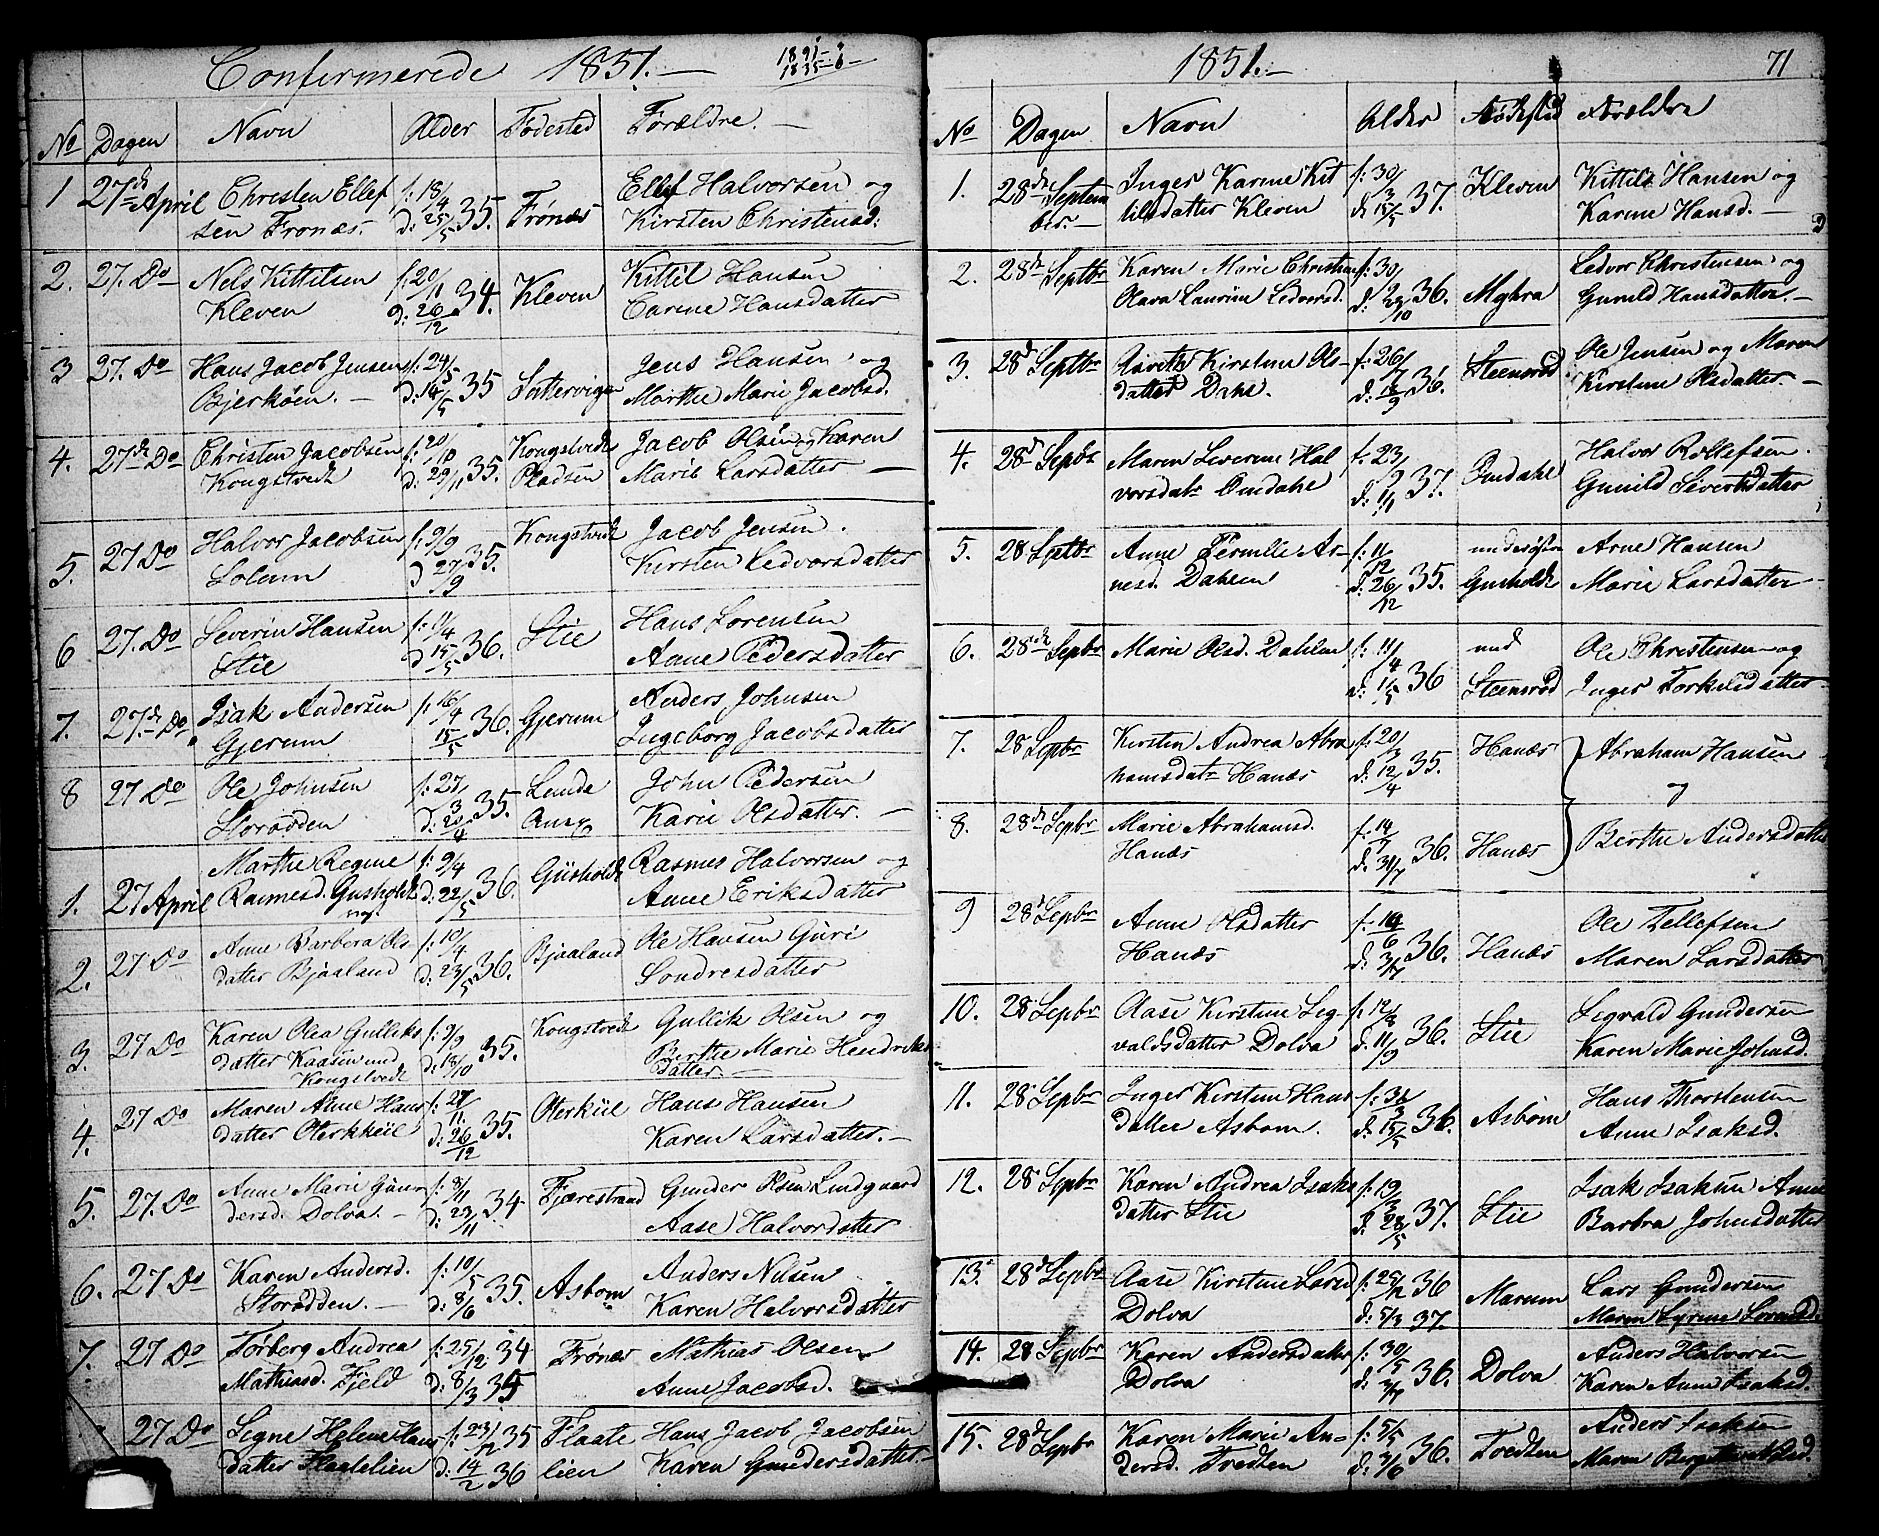 SAKO, Solum kirkebøker, G/Gb/L0001: Klokkerbok nr. II 1, 1848-1859, s. 71